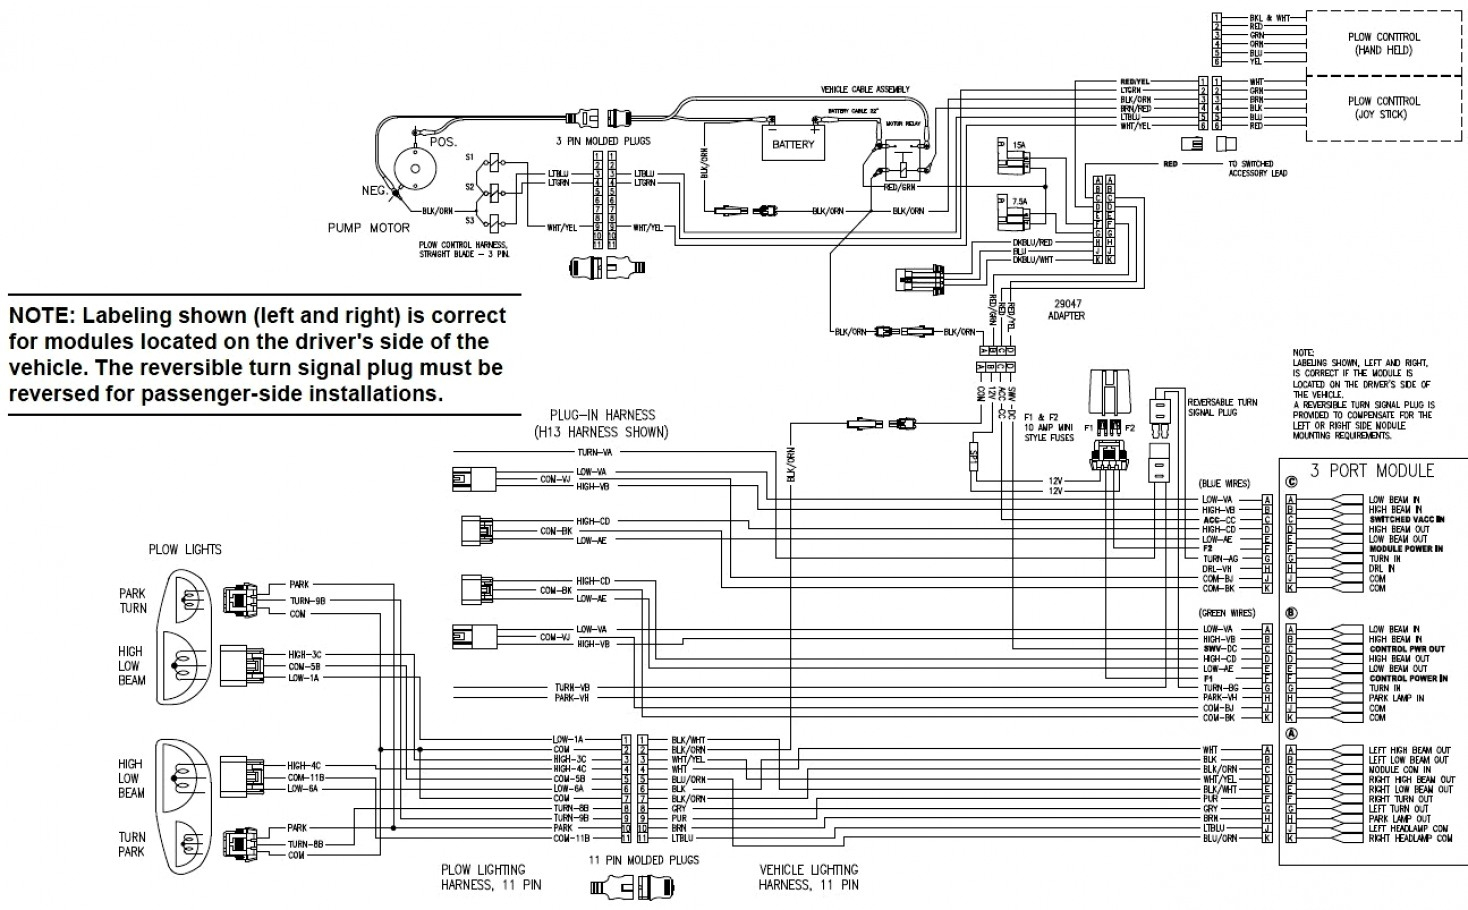 Seven Pin Wiring Diagram Western Plow | Wiring Diagram - Western Plow Solenoid Wiring Diagram